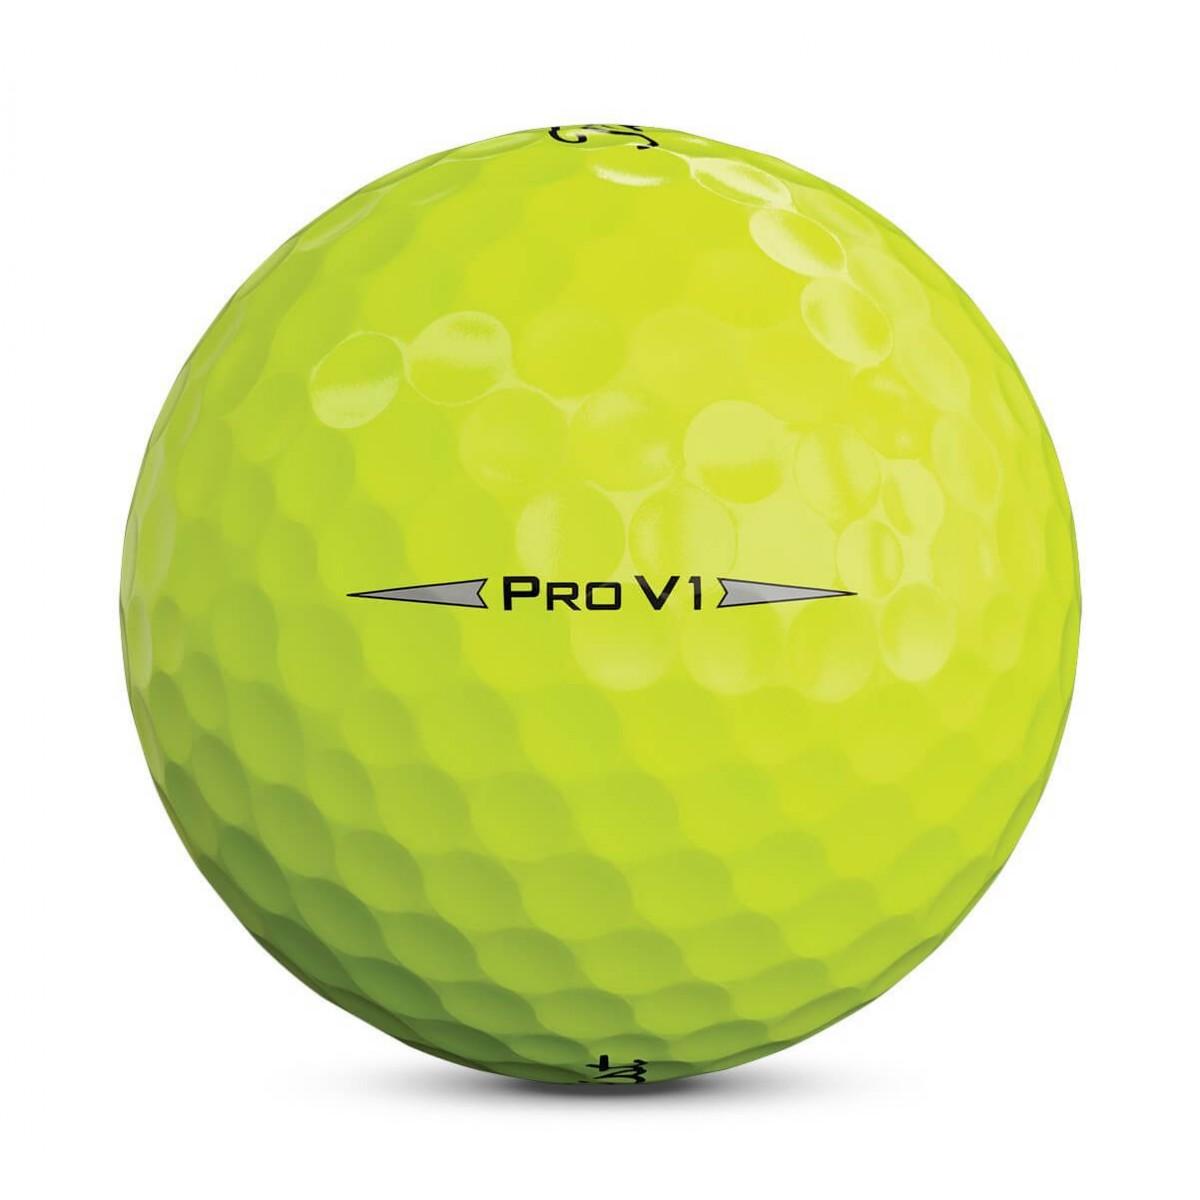 Titleist Pro V1 Yellow Personalized Golf Balls